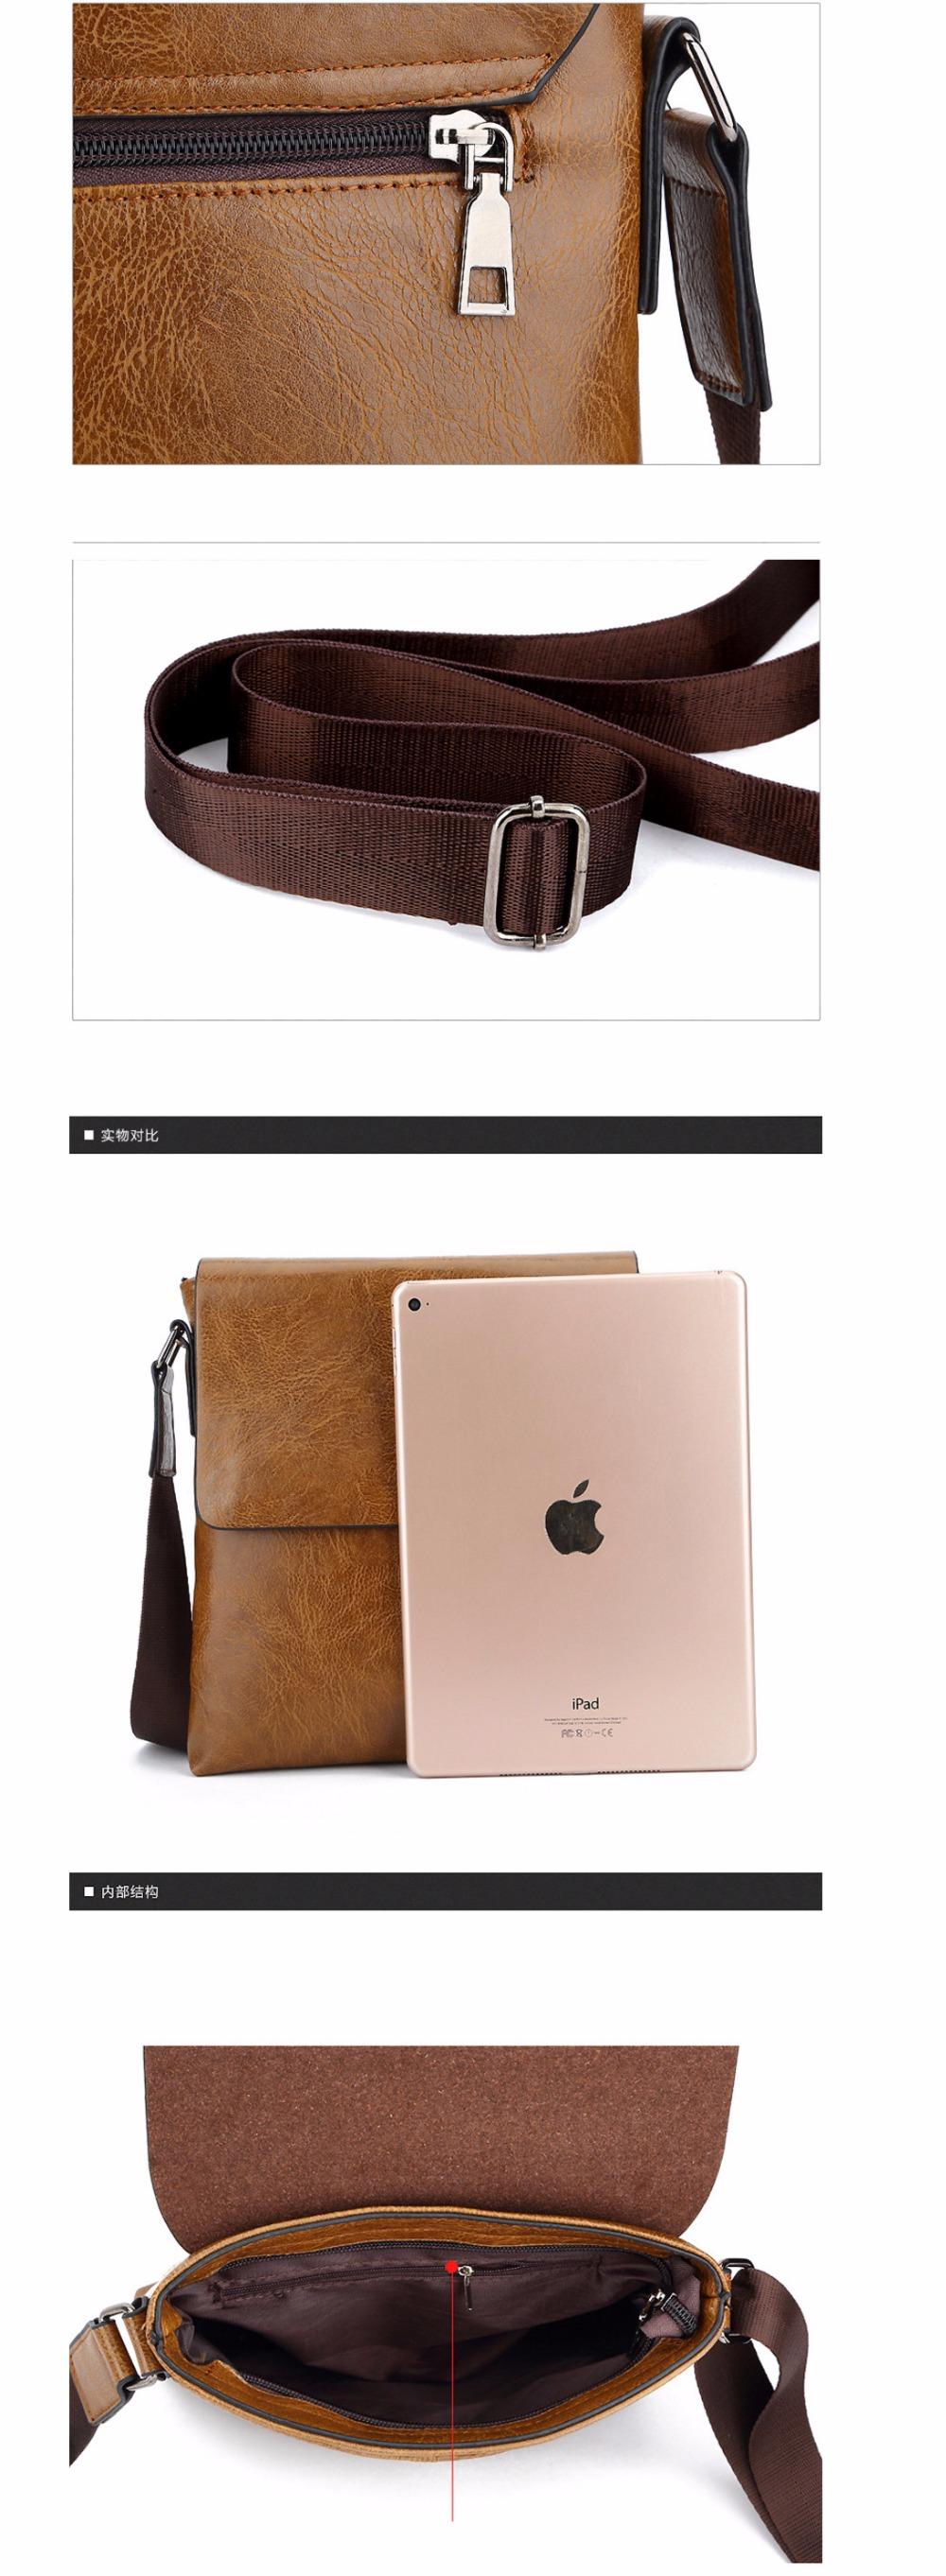 842d091375b8 Designer POLO Bags Hot Sale Messenger Bag Men Leather High Quality  Crossbody Man Shoulder Bag. NB402 01 NB402 02 NB402 03 NB402 04 NB402 05  NB402 059 ...